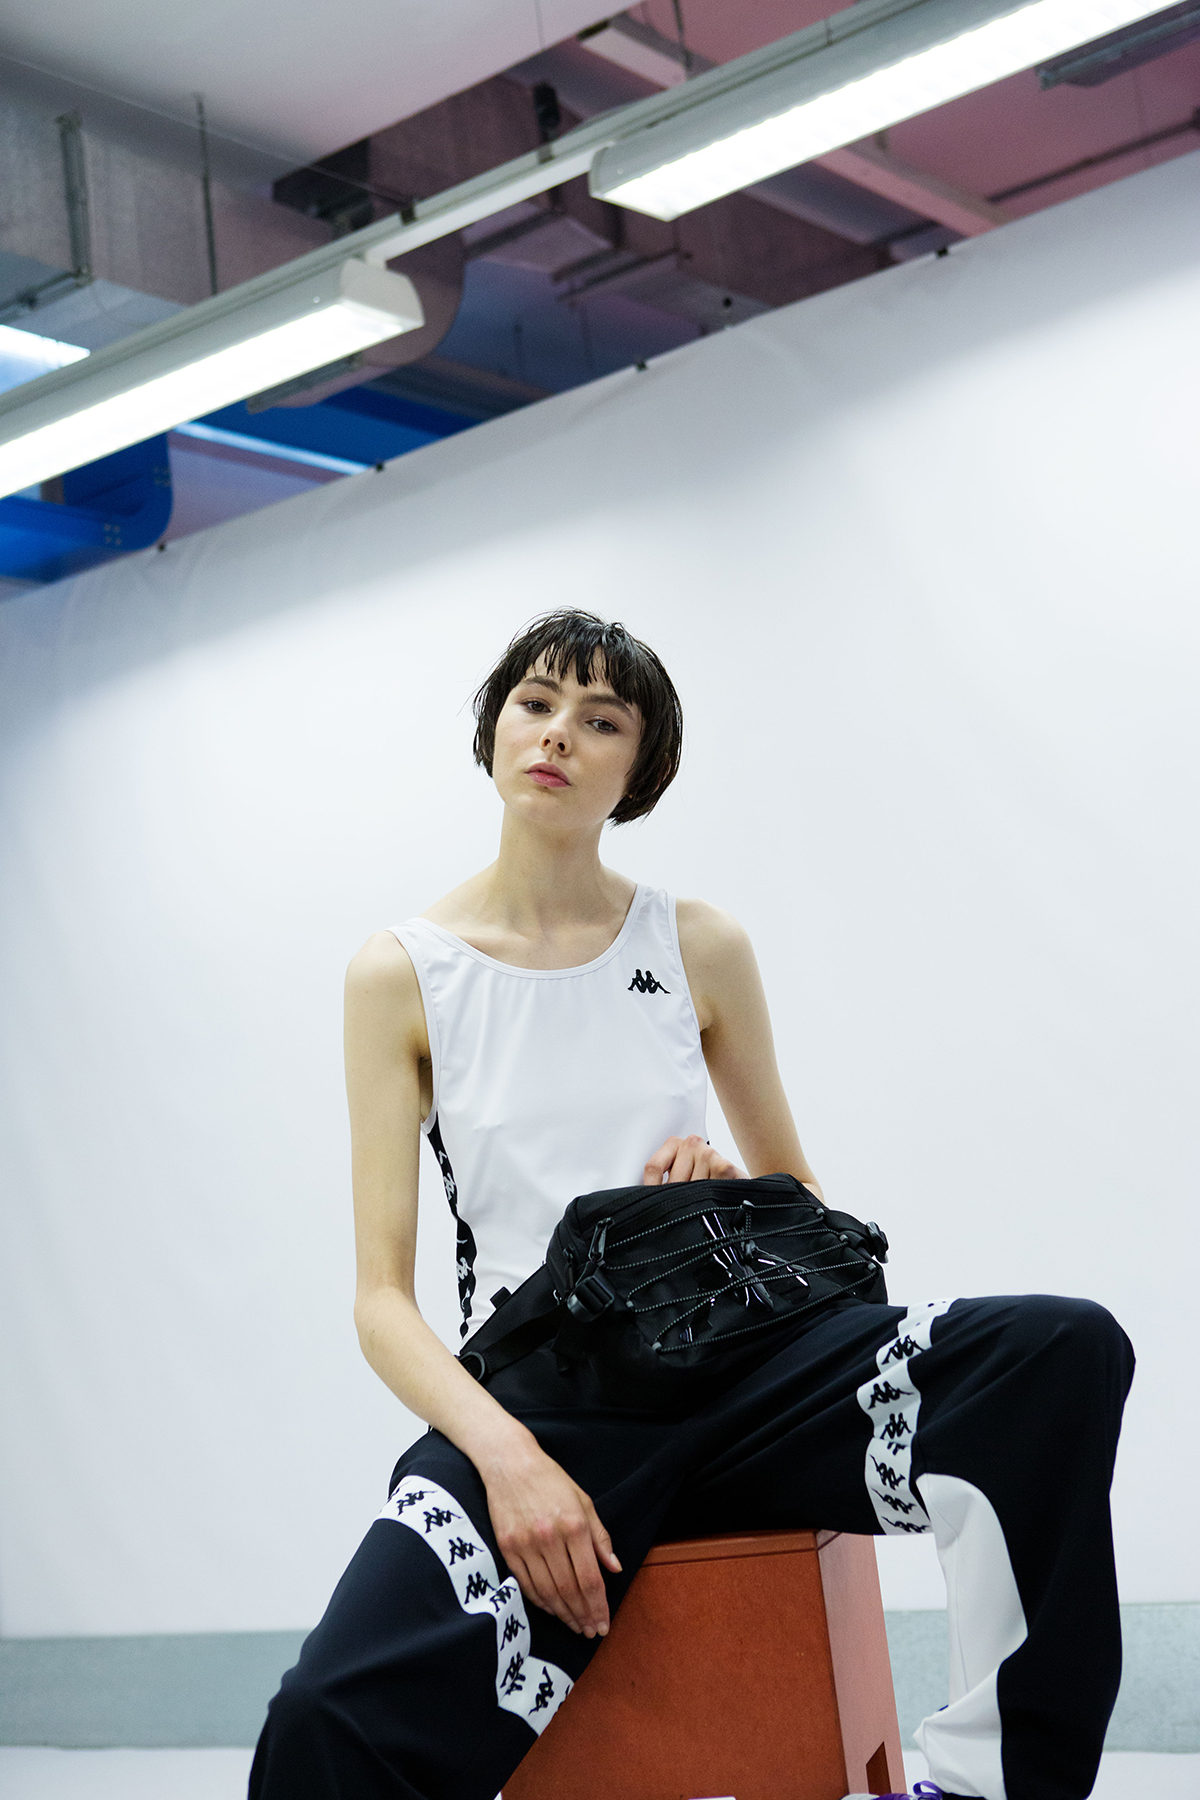 11_kappa_runway_editorial_fashion_federica_borgato